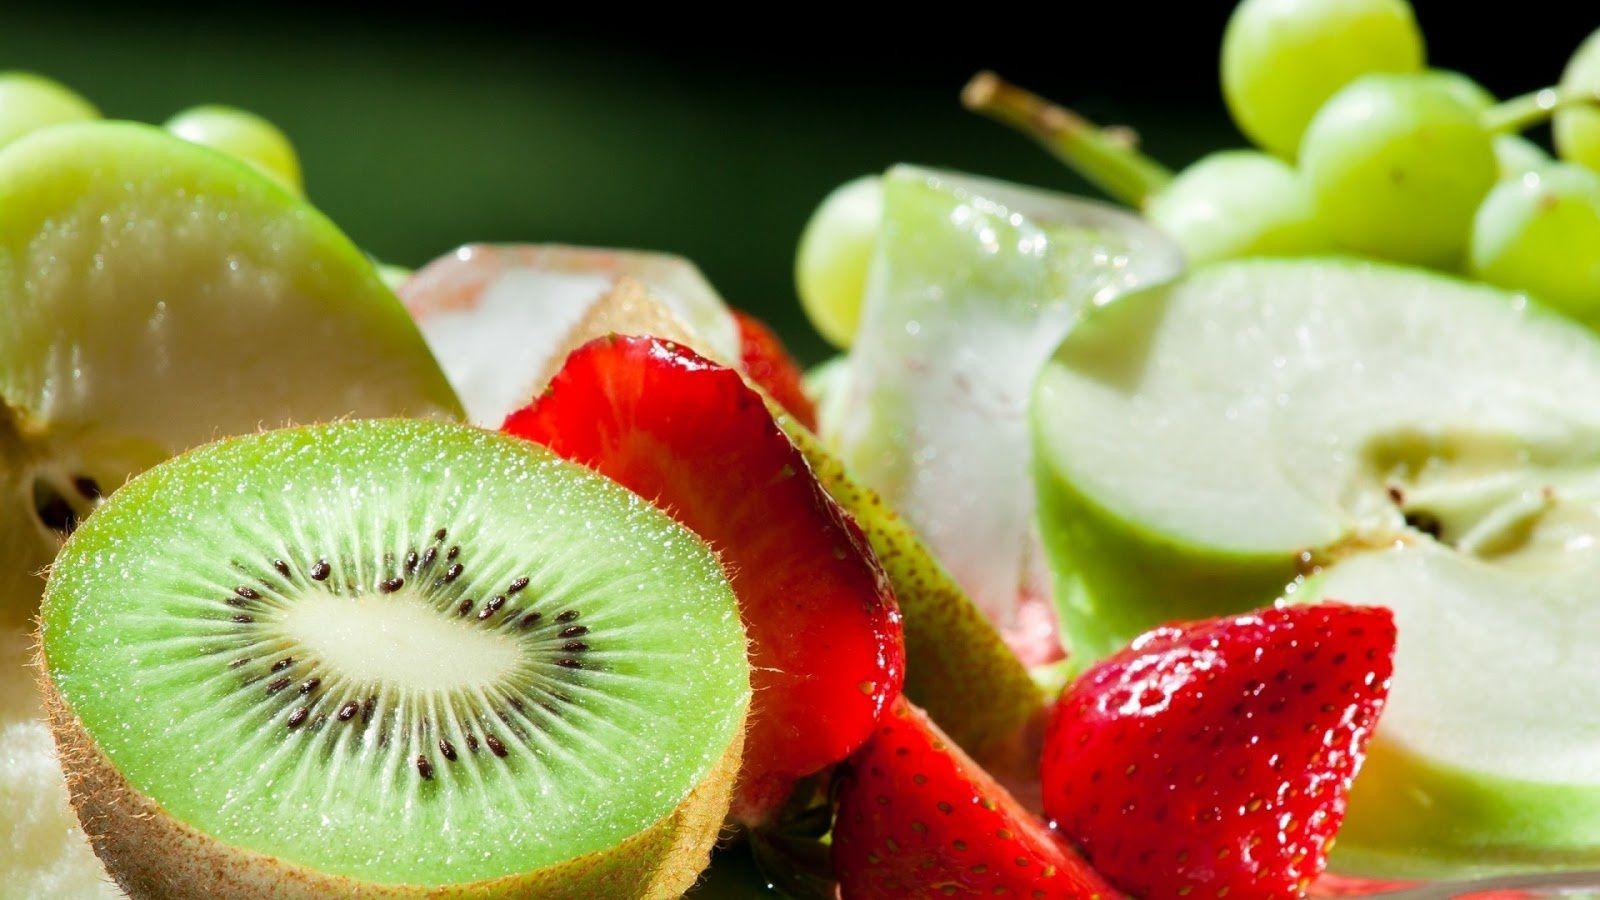 Kiwis - Fraises - Fruits - Wallpaper - Free